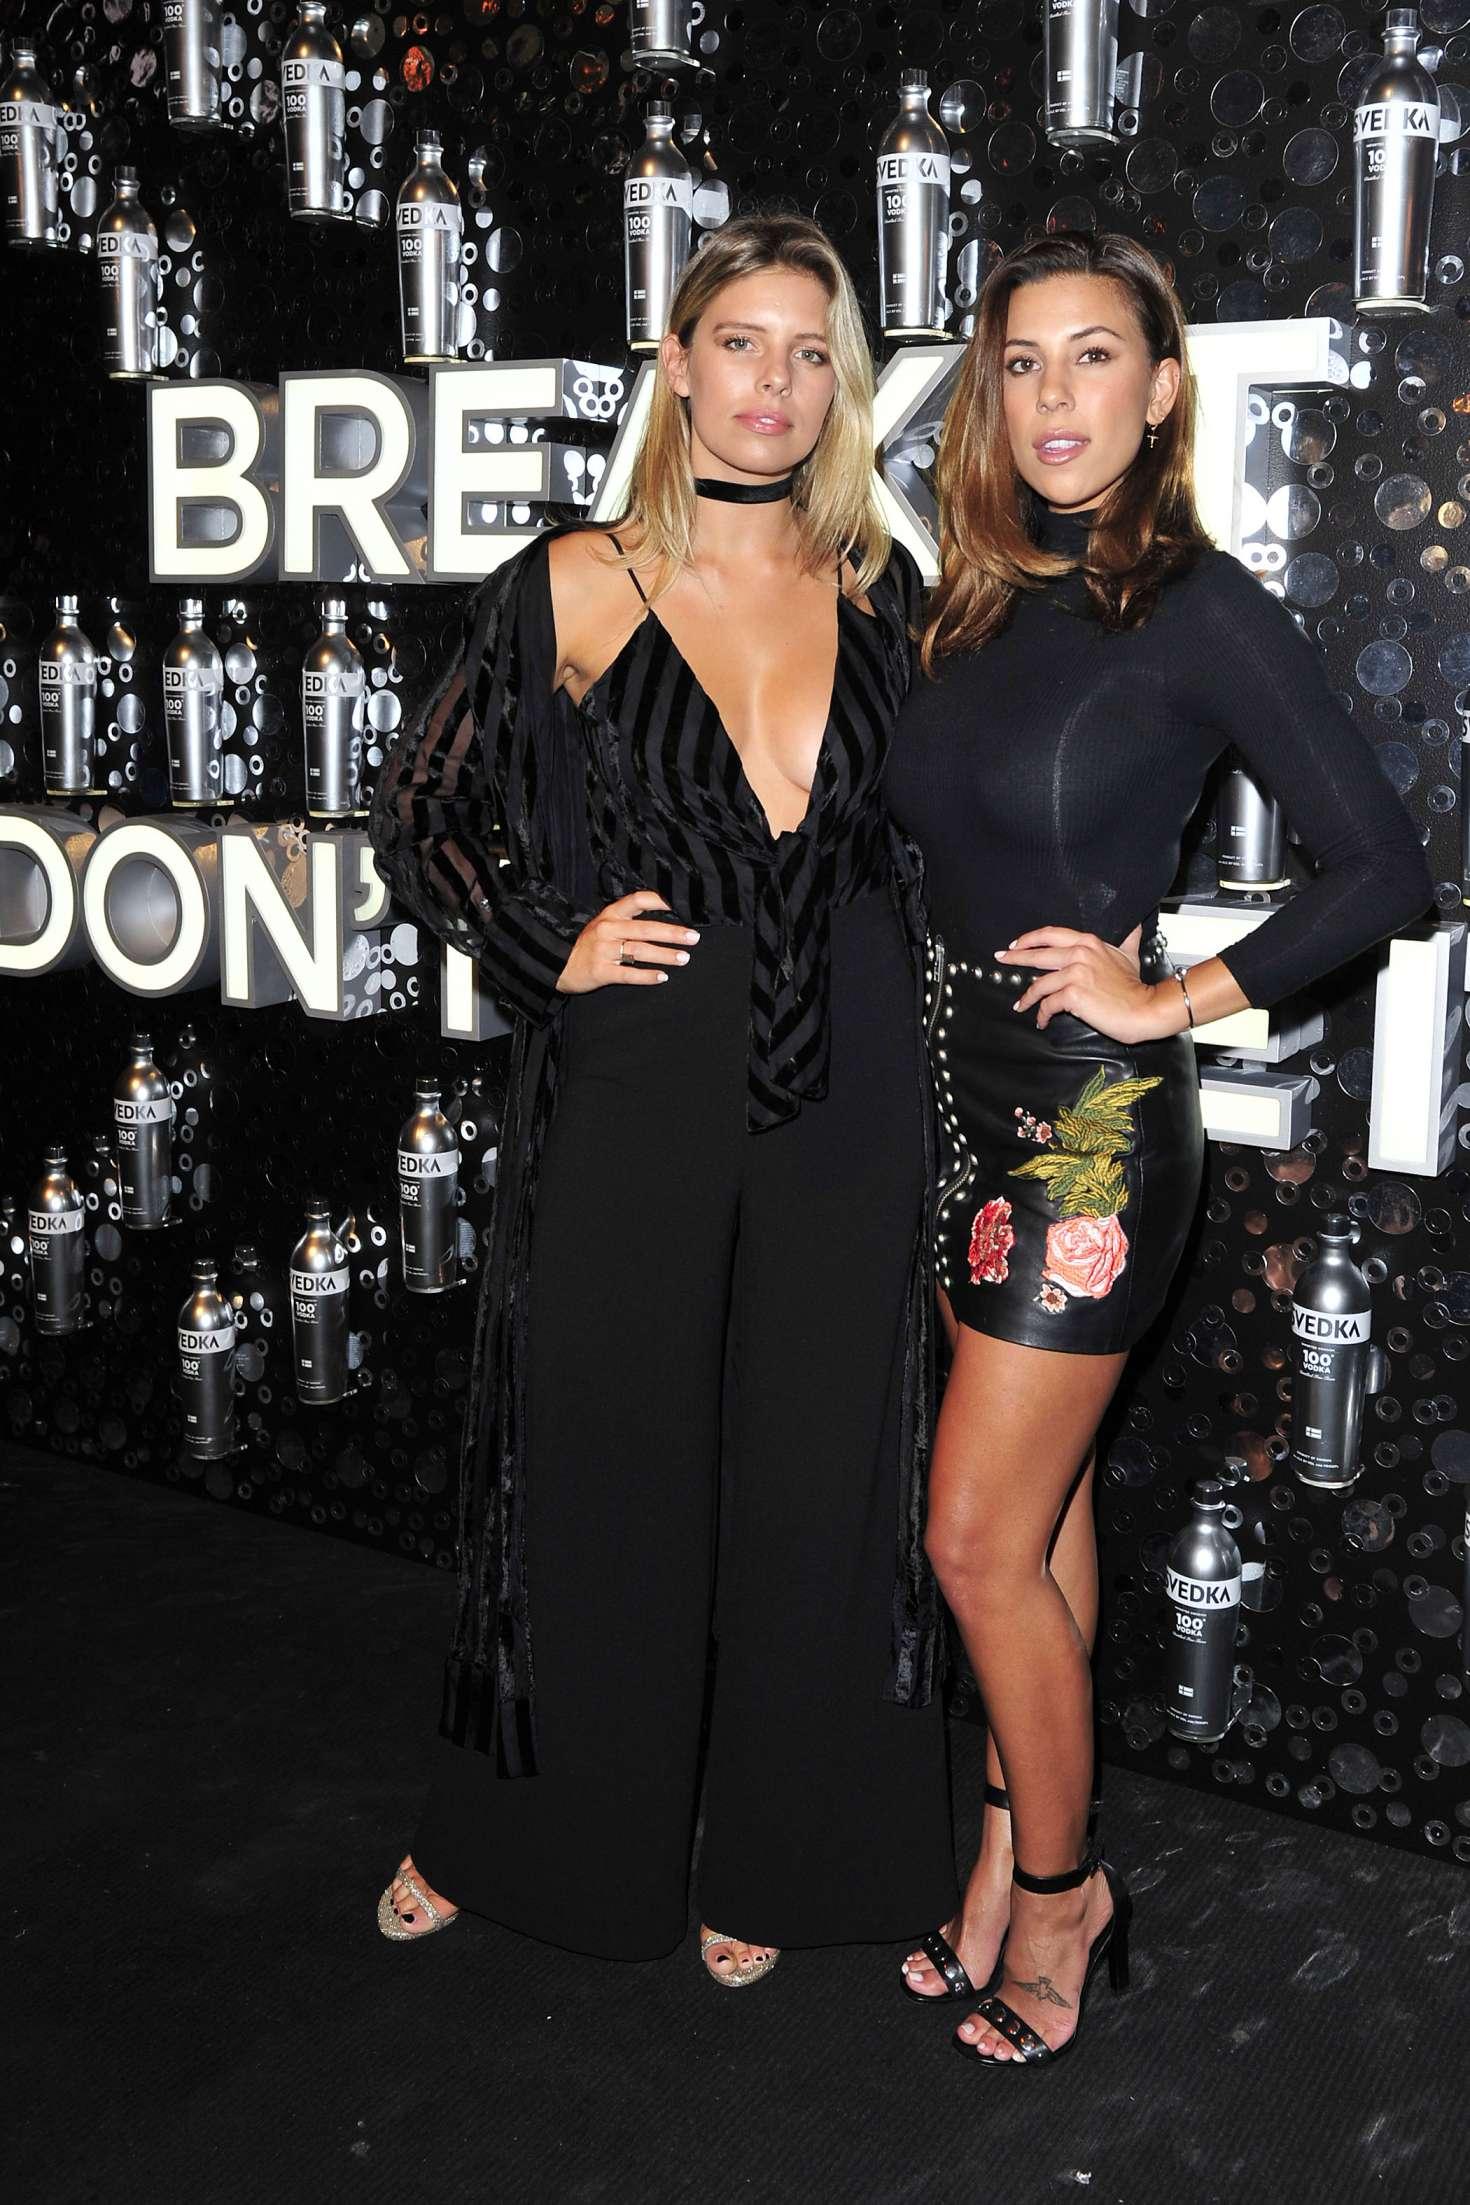 Devin Brugman and Natasha Oakley - Svedka Vodka's Broken Resolutions Bash in LA